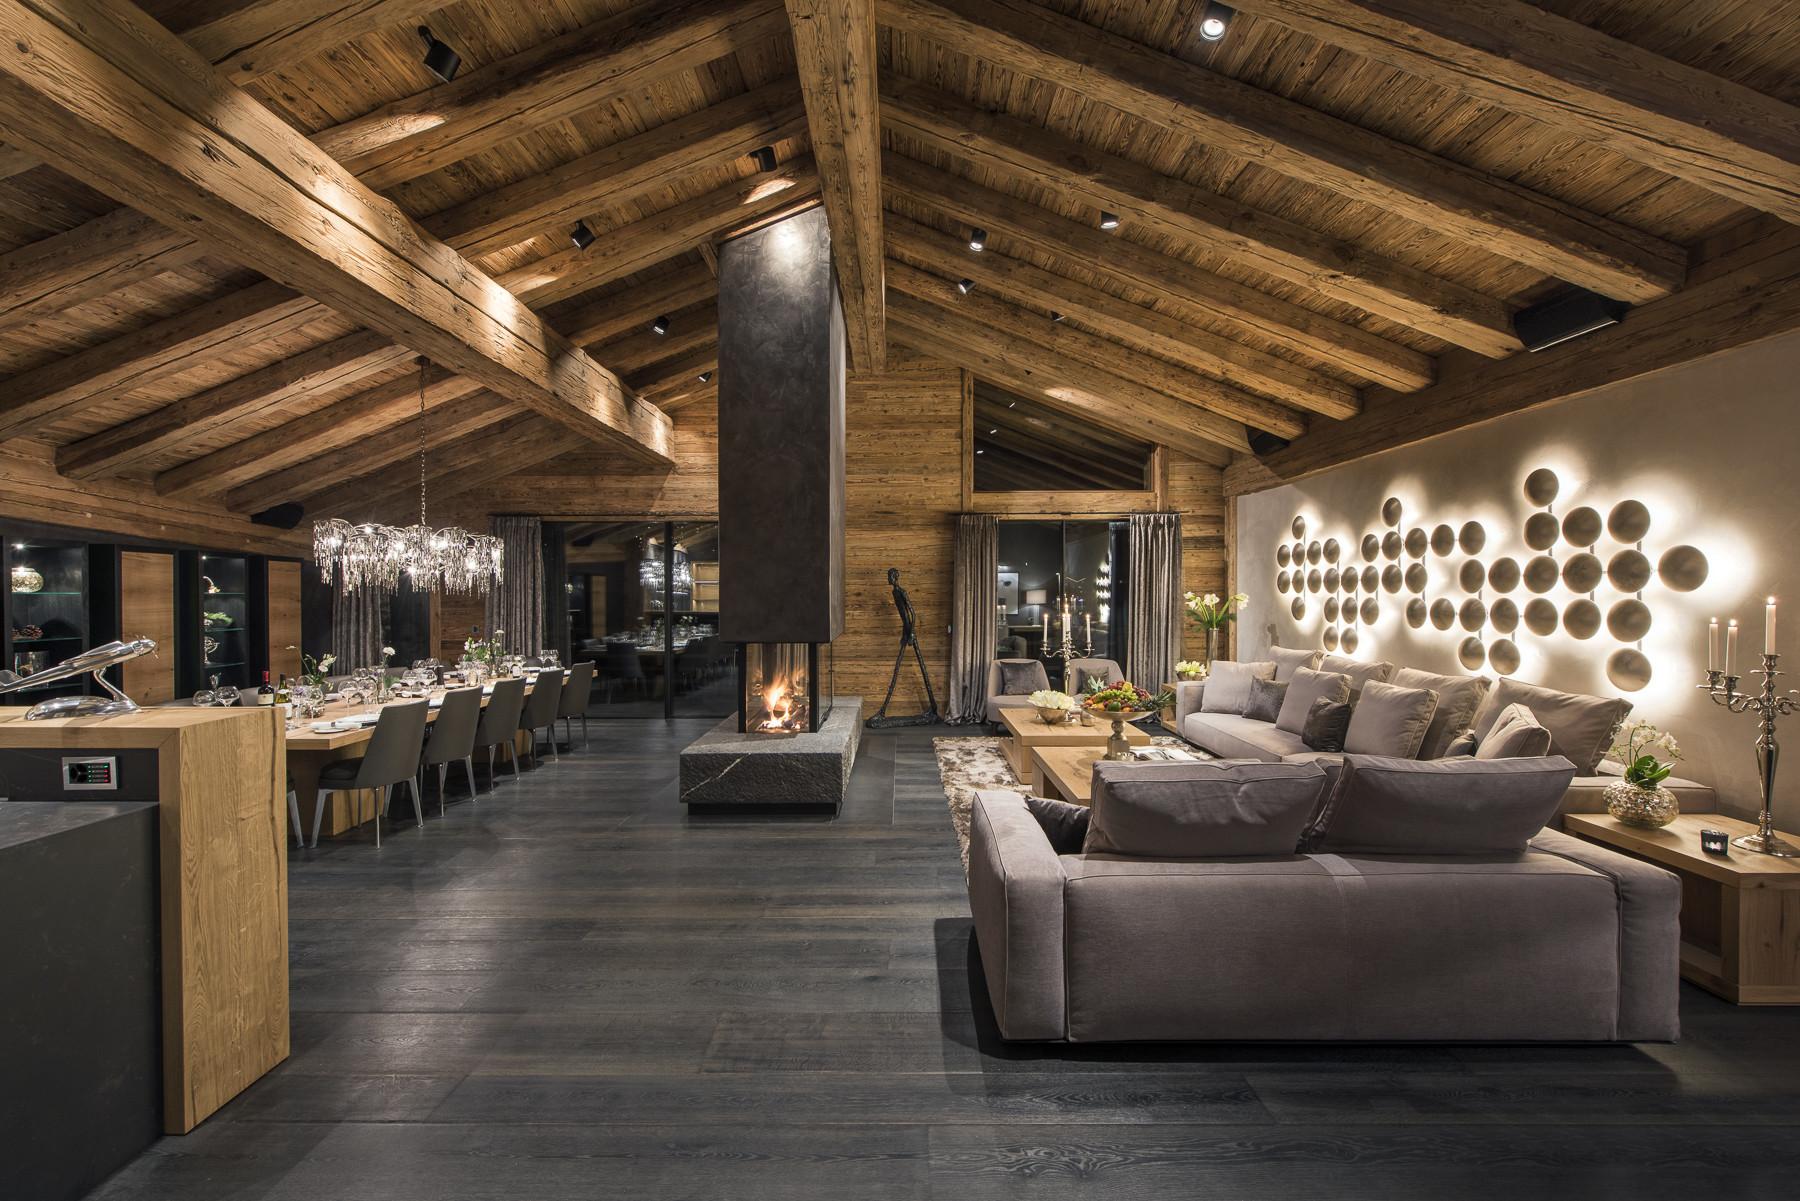 Kings-avenue-zermatt-snow-chalet-indoor-jacuzzi-hammam-childfriendly-spa-wellness-03-1